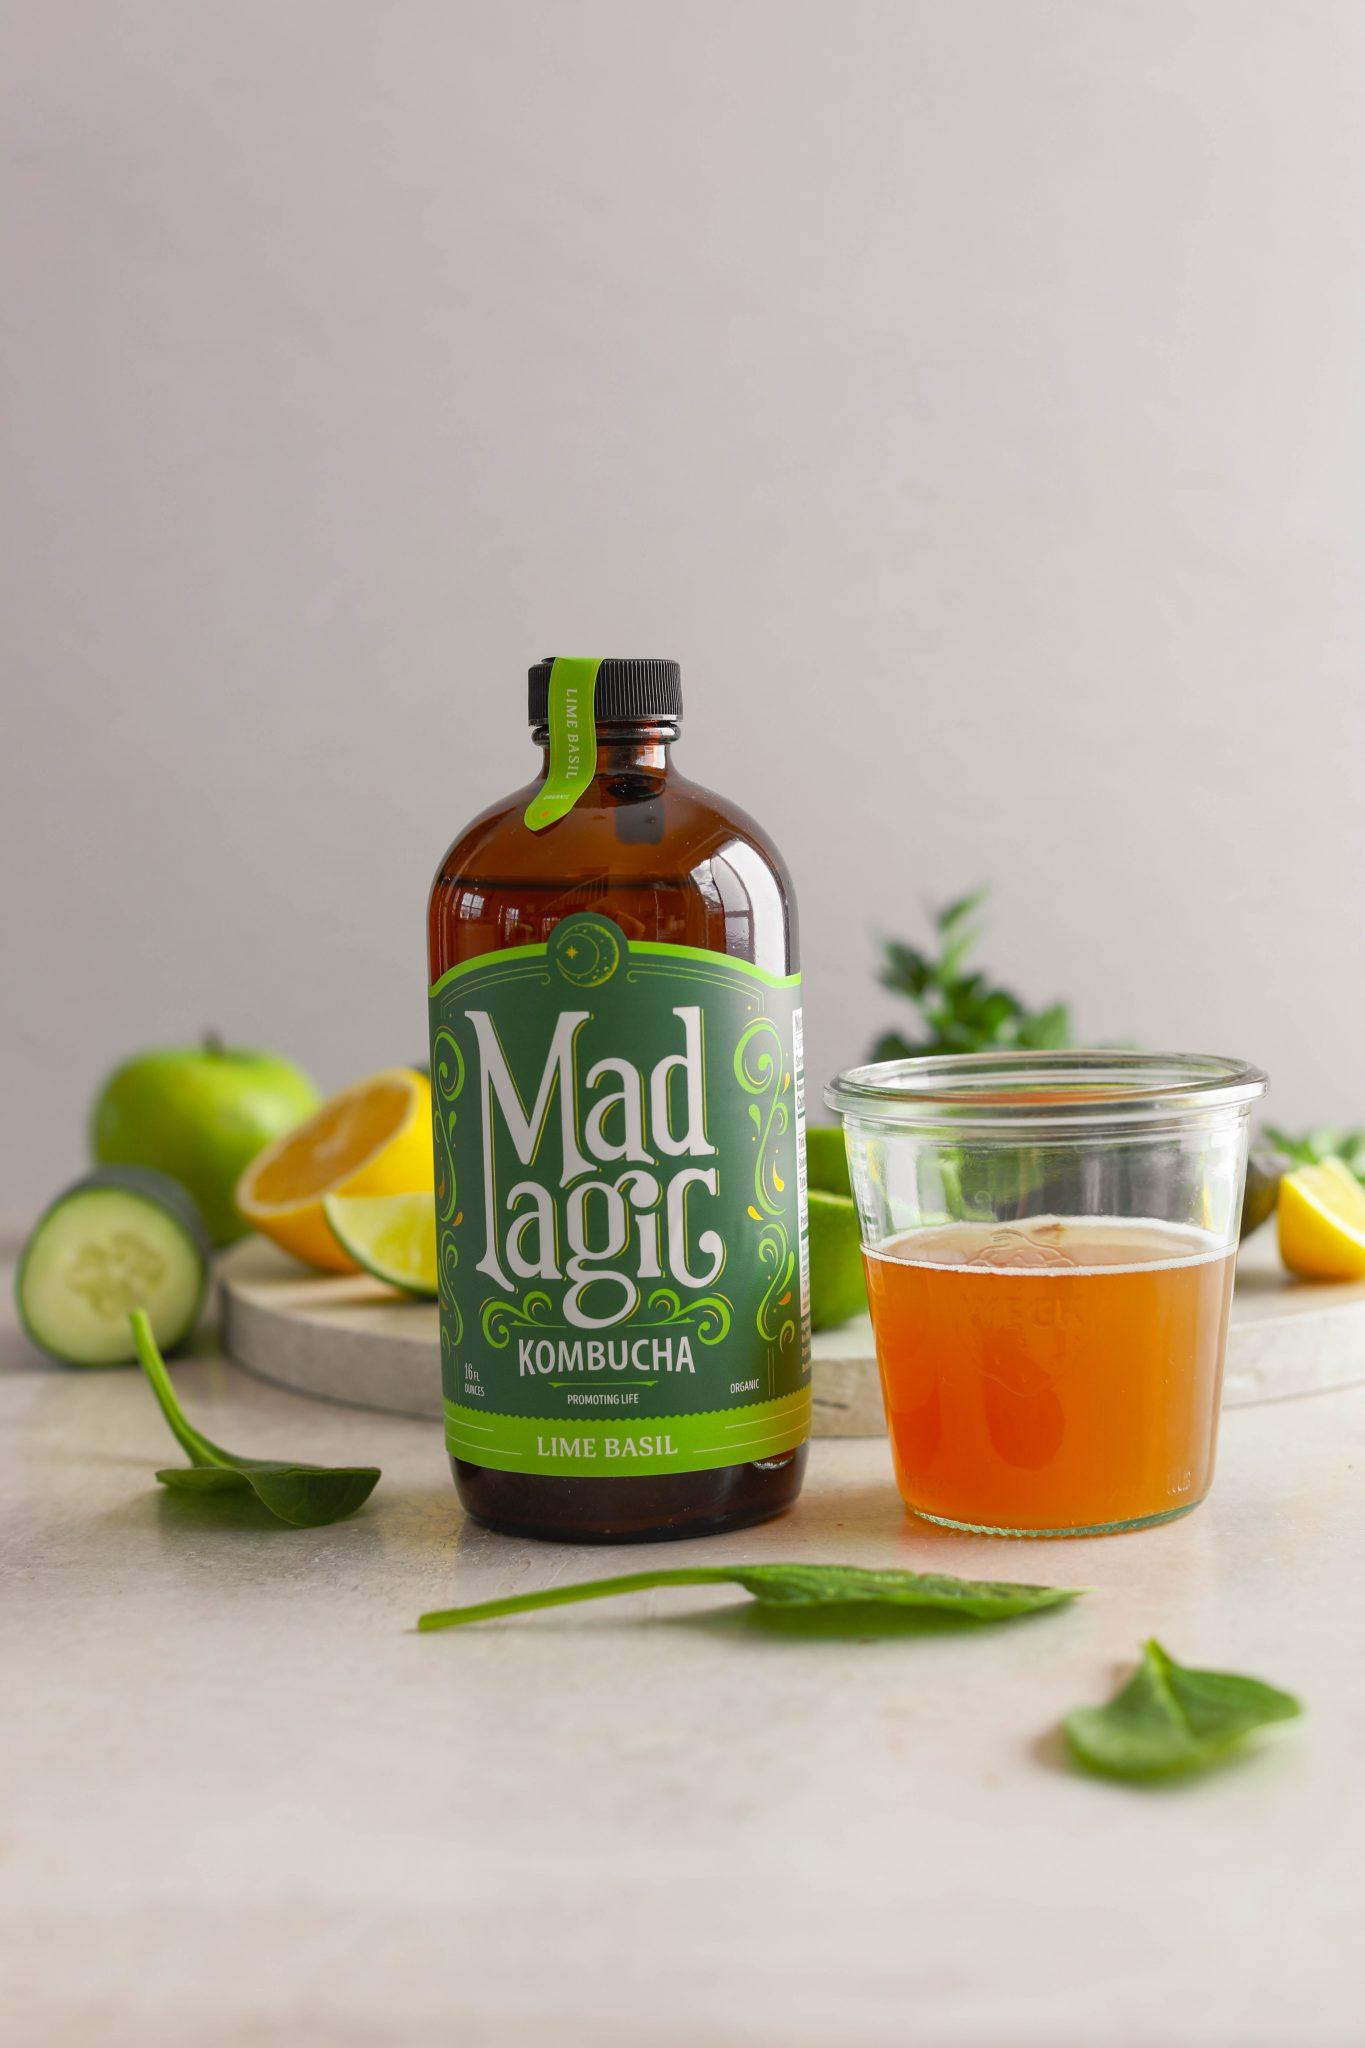 Mad Magic Lime Basil